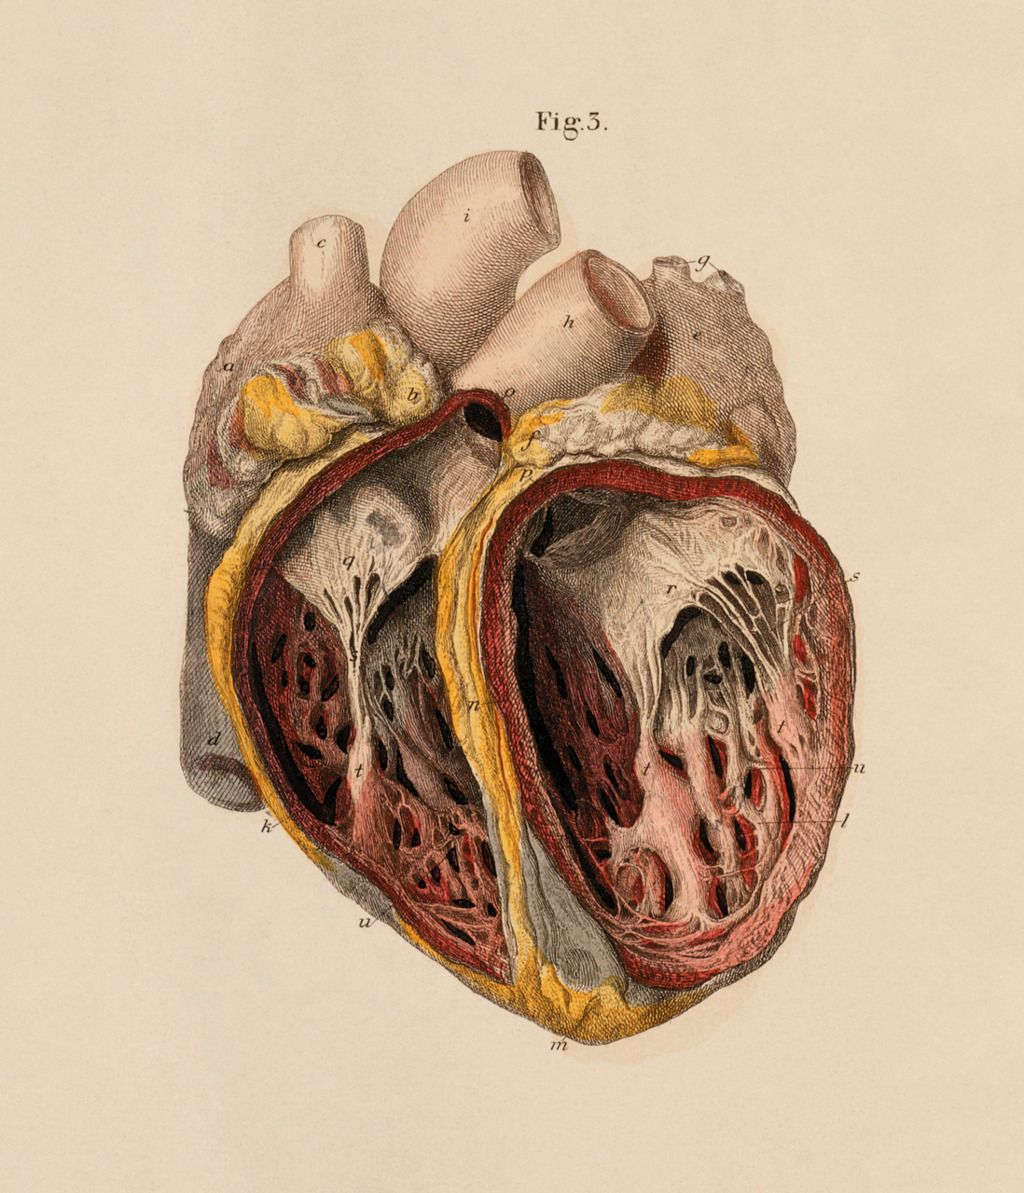 Vintage Anatomical Heart Drawing Vah10 Art Pinterest